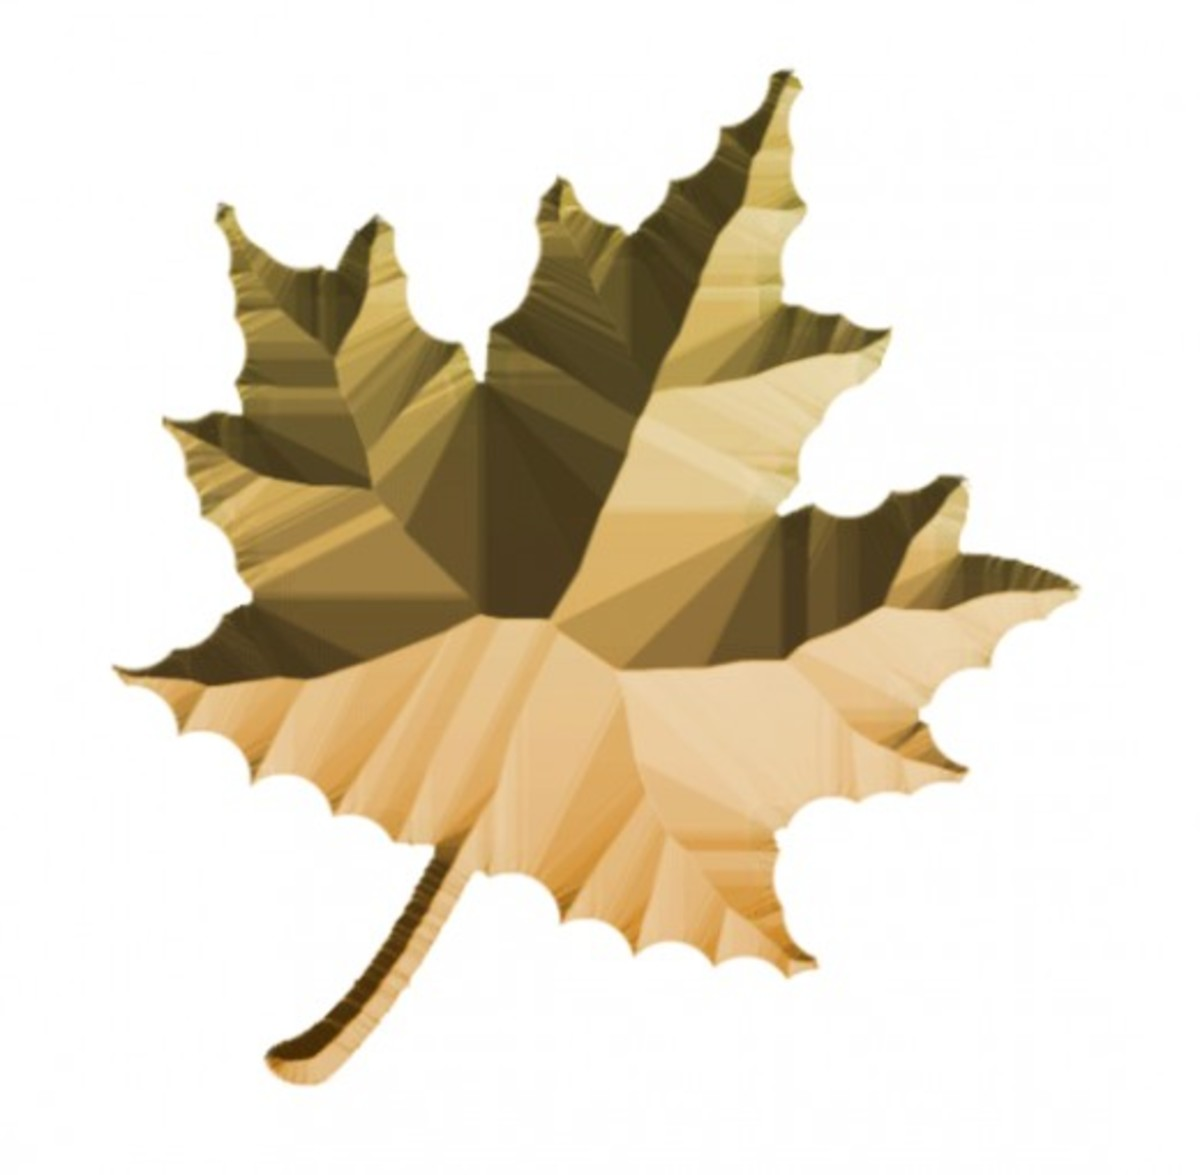 Textured foliage 2.